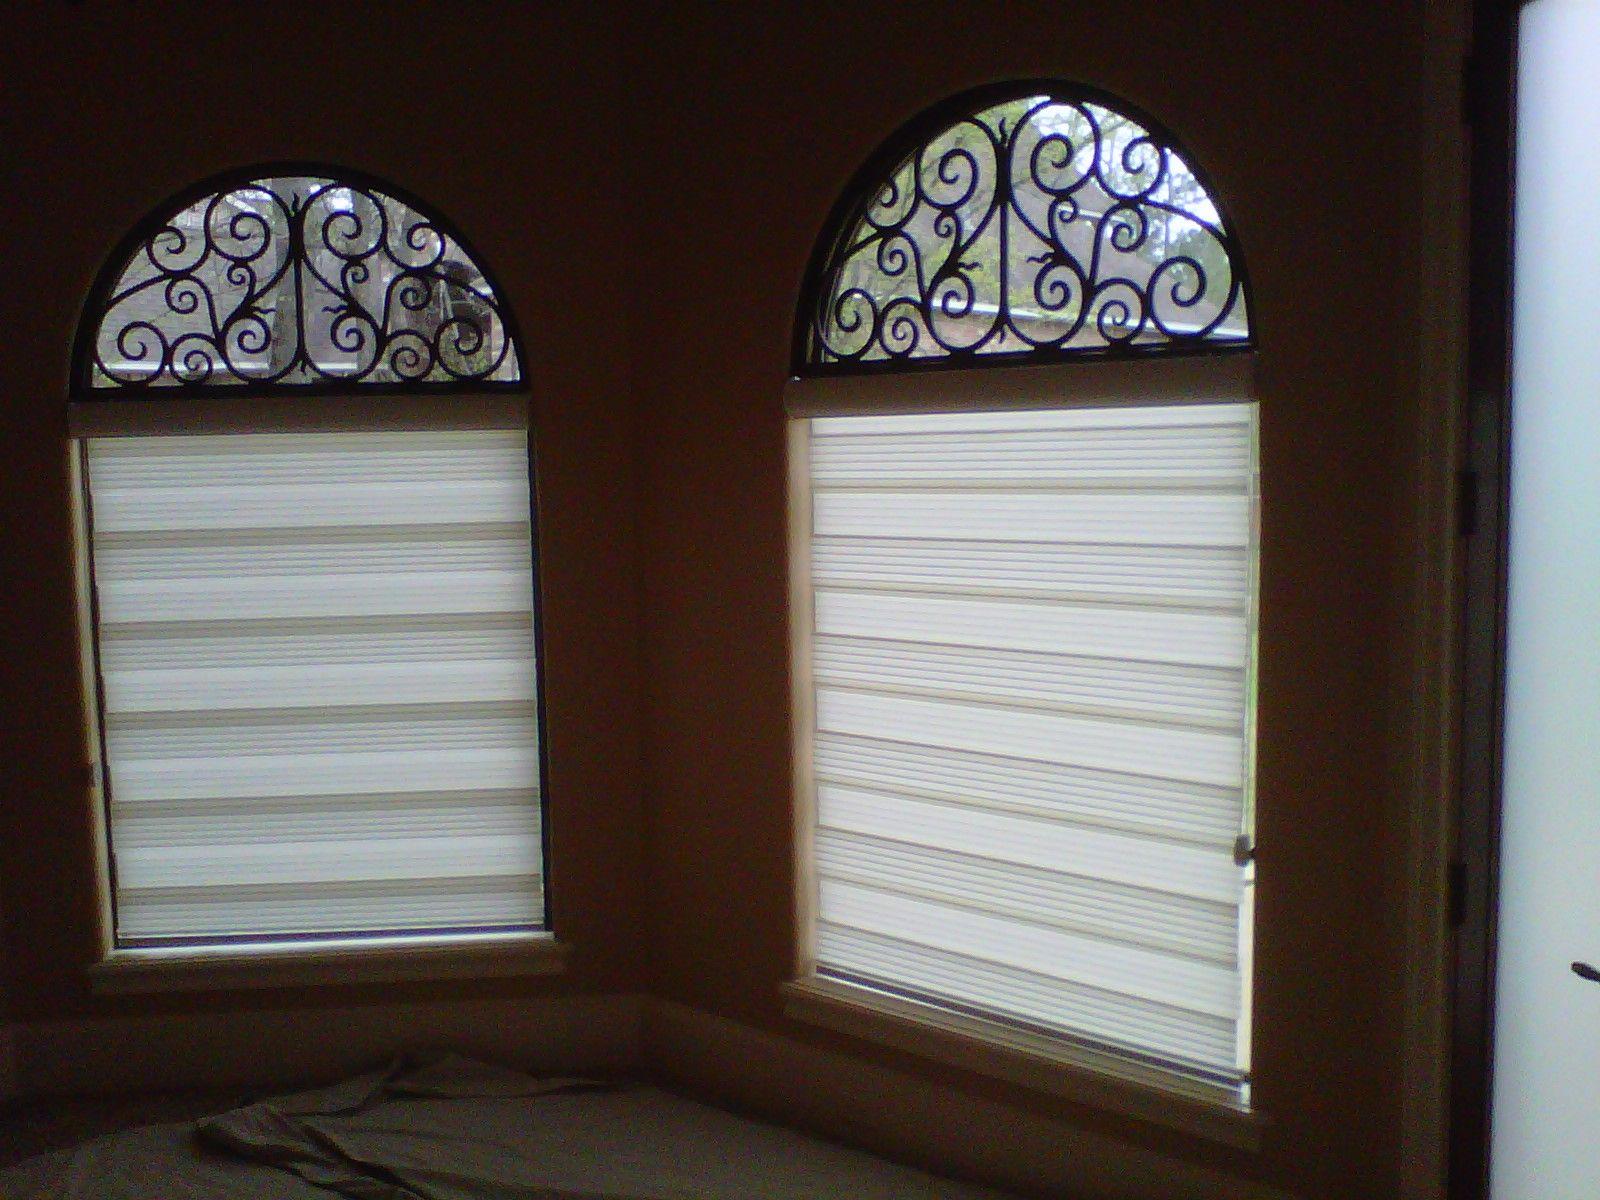 Hunting blind window ideas  stoneside designer john hatter from texas uses transition shades